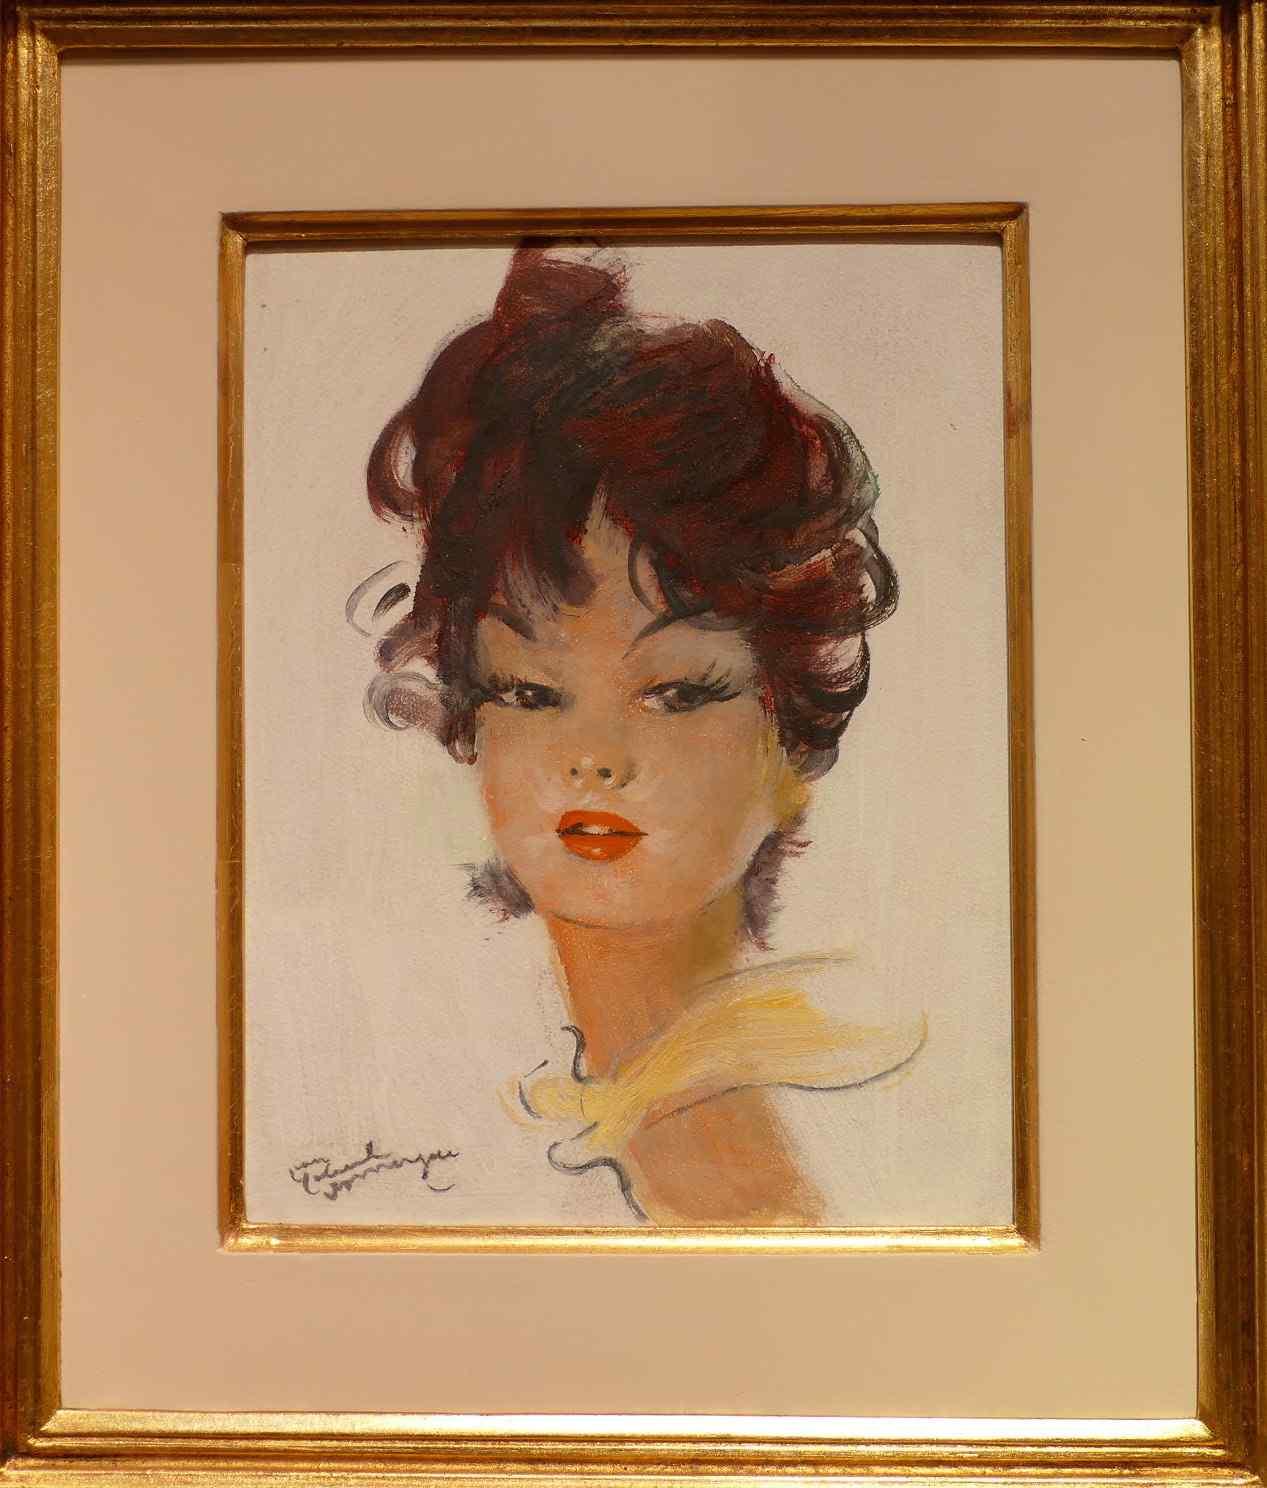 Portrait of a young woman by Jean Gabriel Domergue